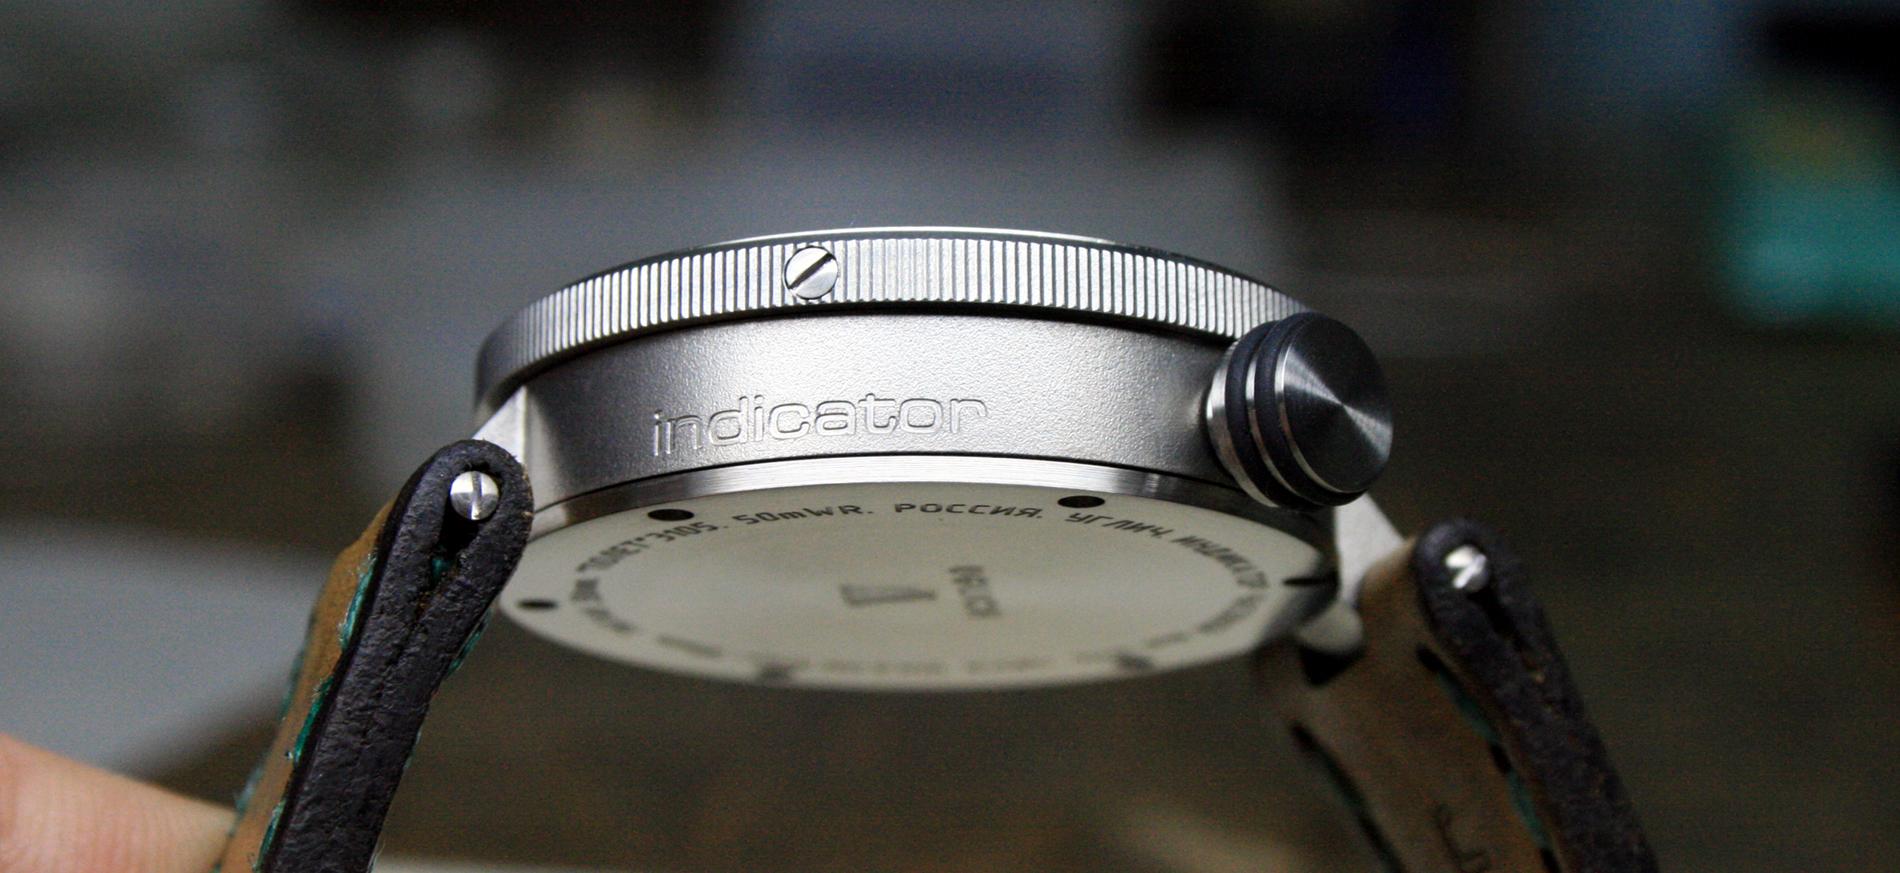 New RUSSIAN time tool INDICATOR-img_8382-1.jpg